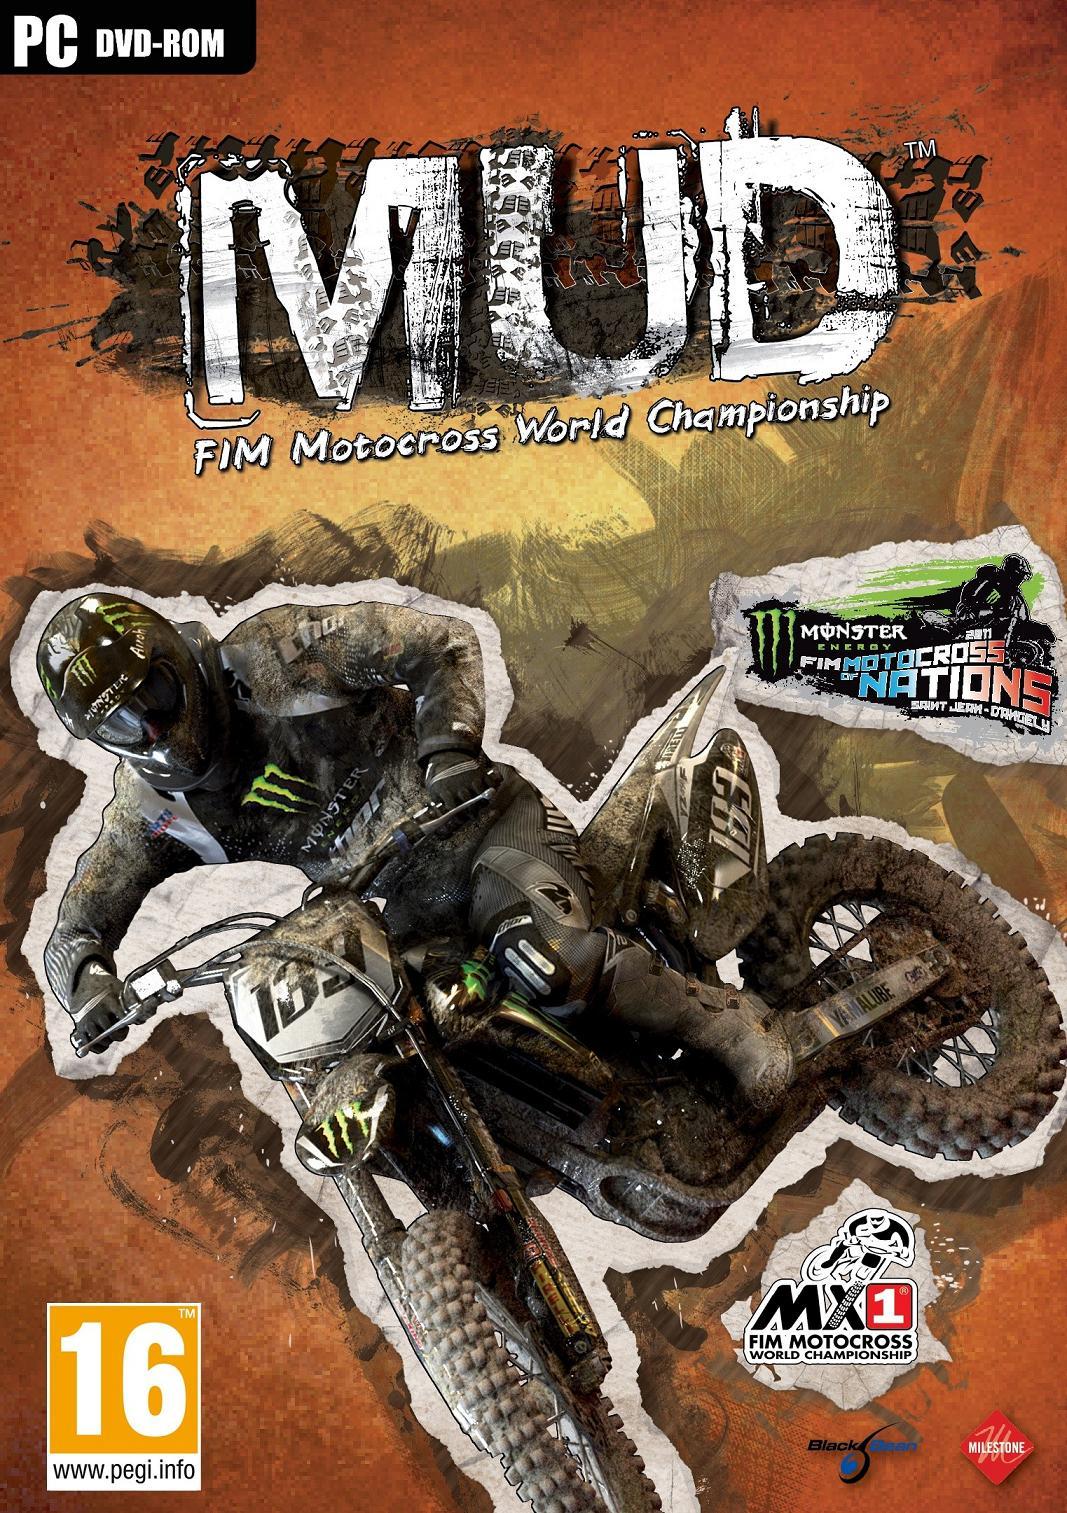 MUD - FIM MOTOCROSS WORLD CHAMPIONSHIP - PC